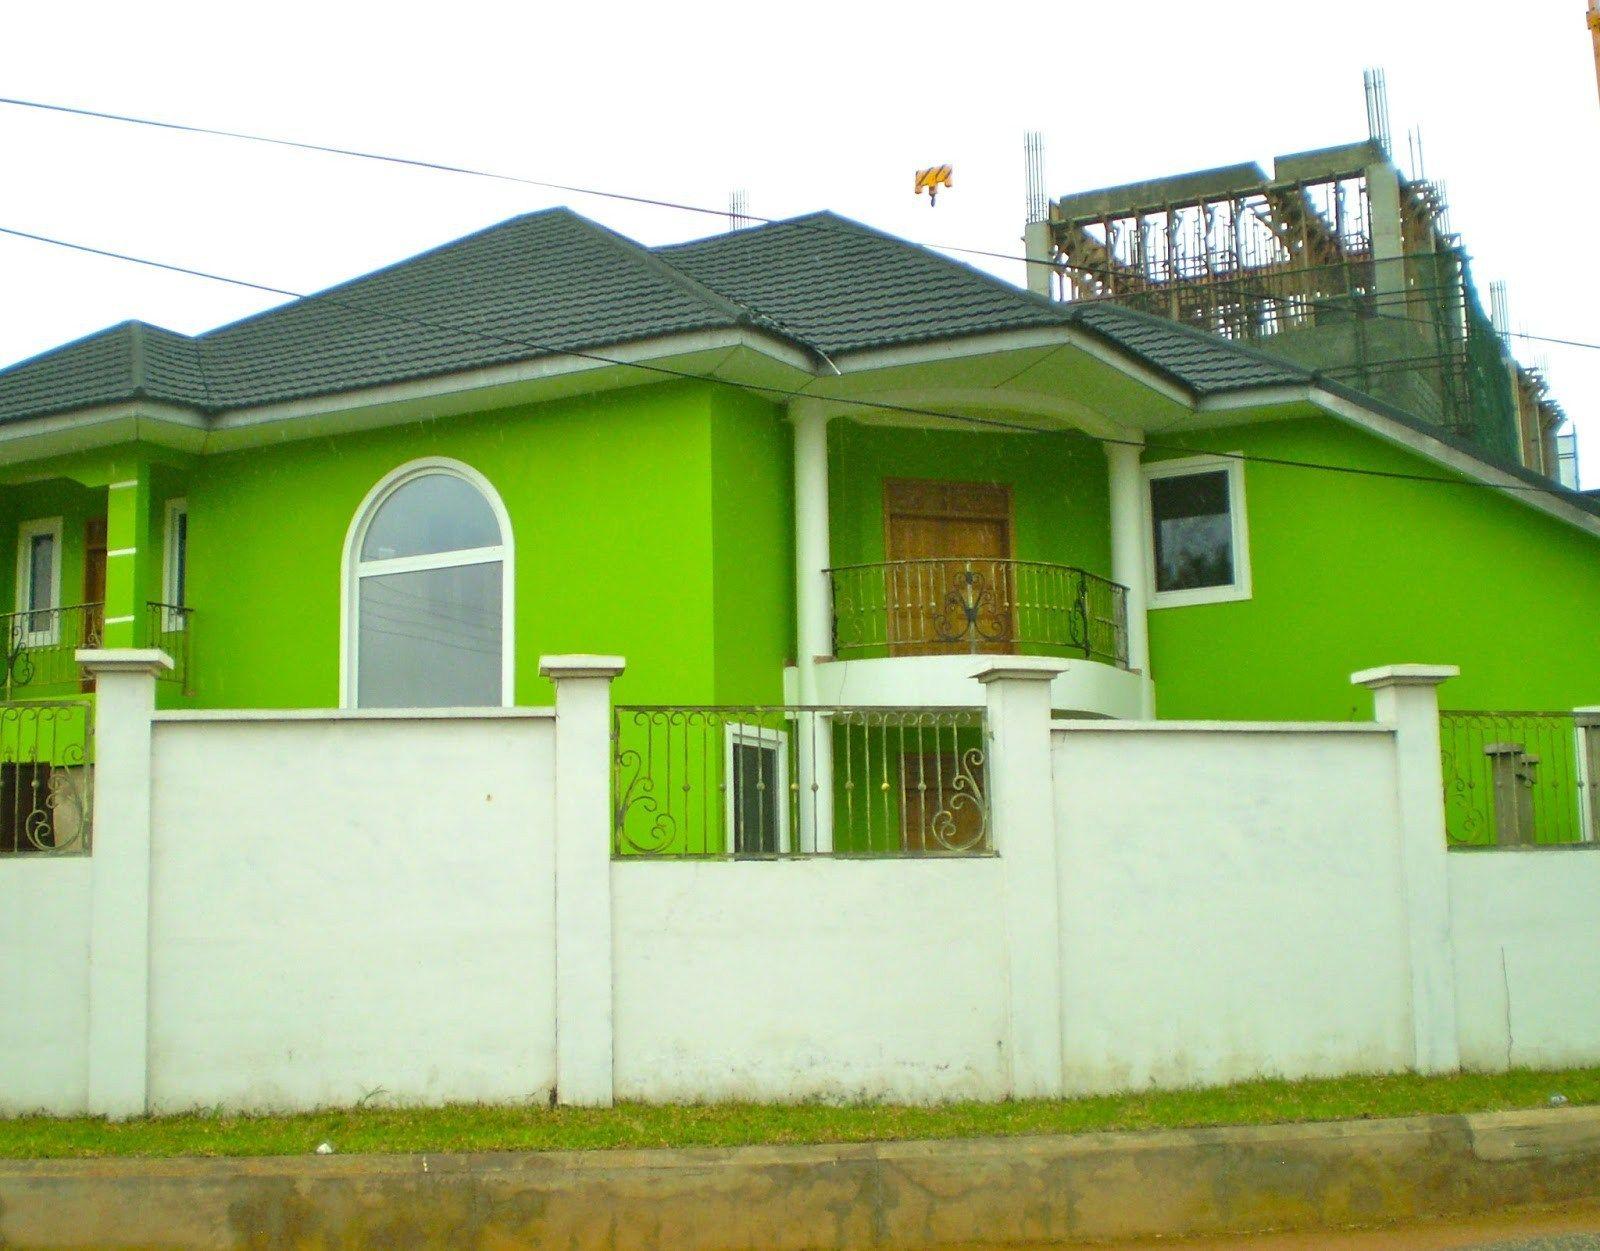 Luxury First Home Paint Ideas | Paint ideas, Idea paint and Luxury